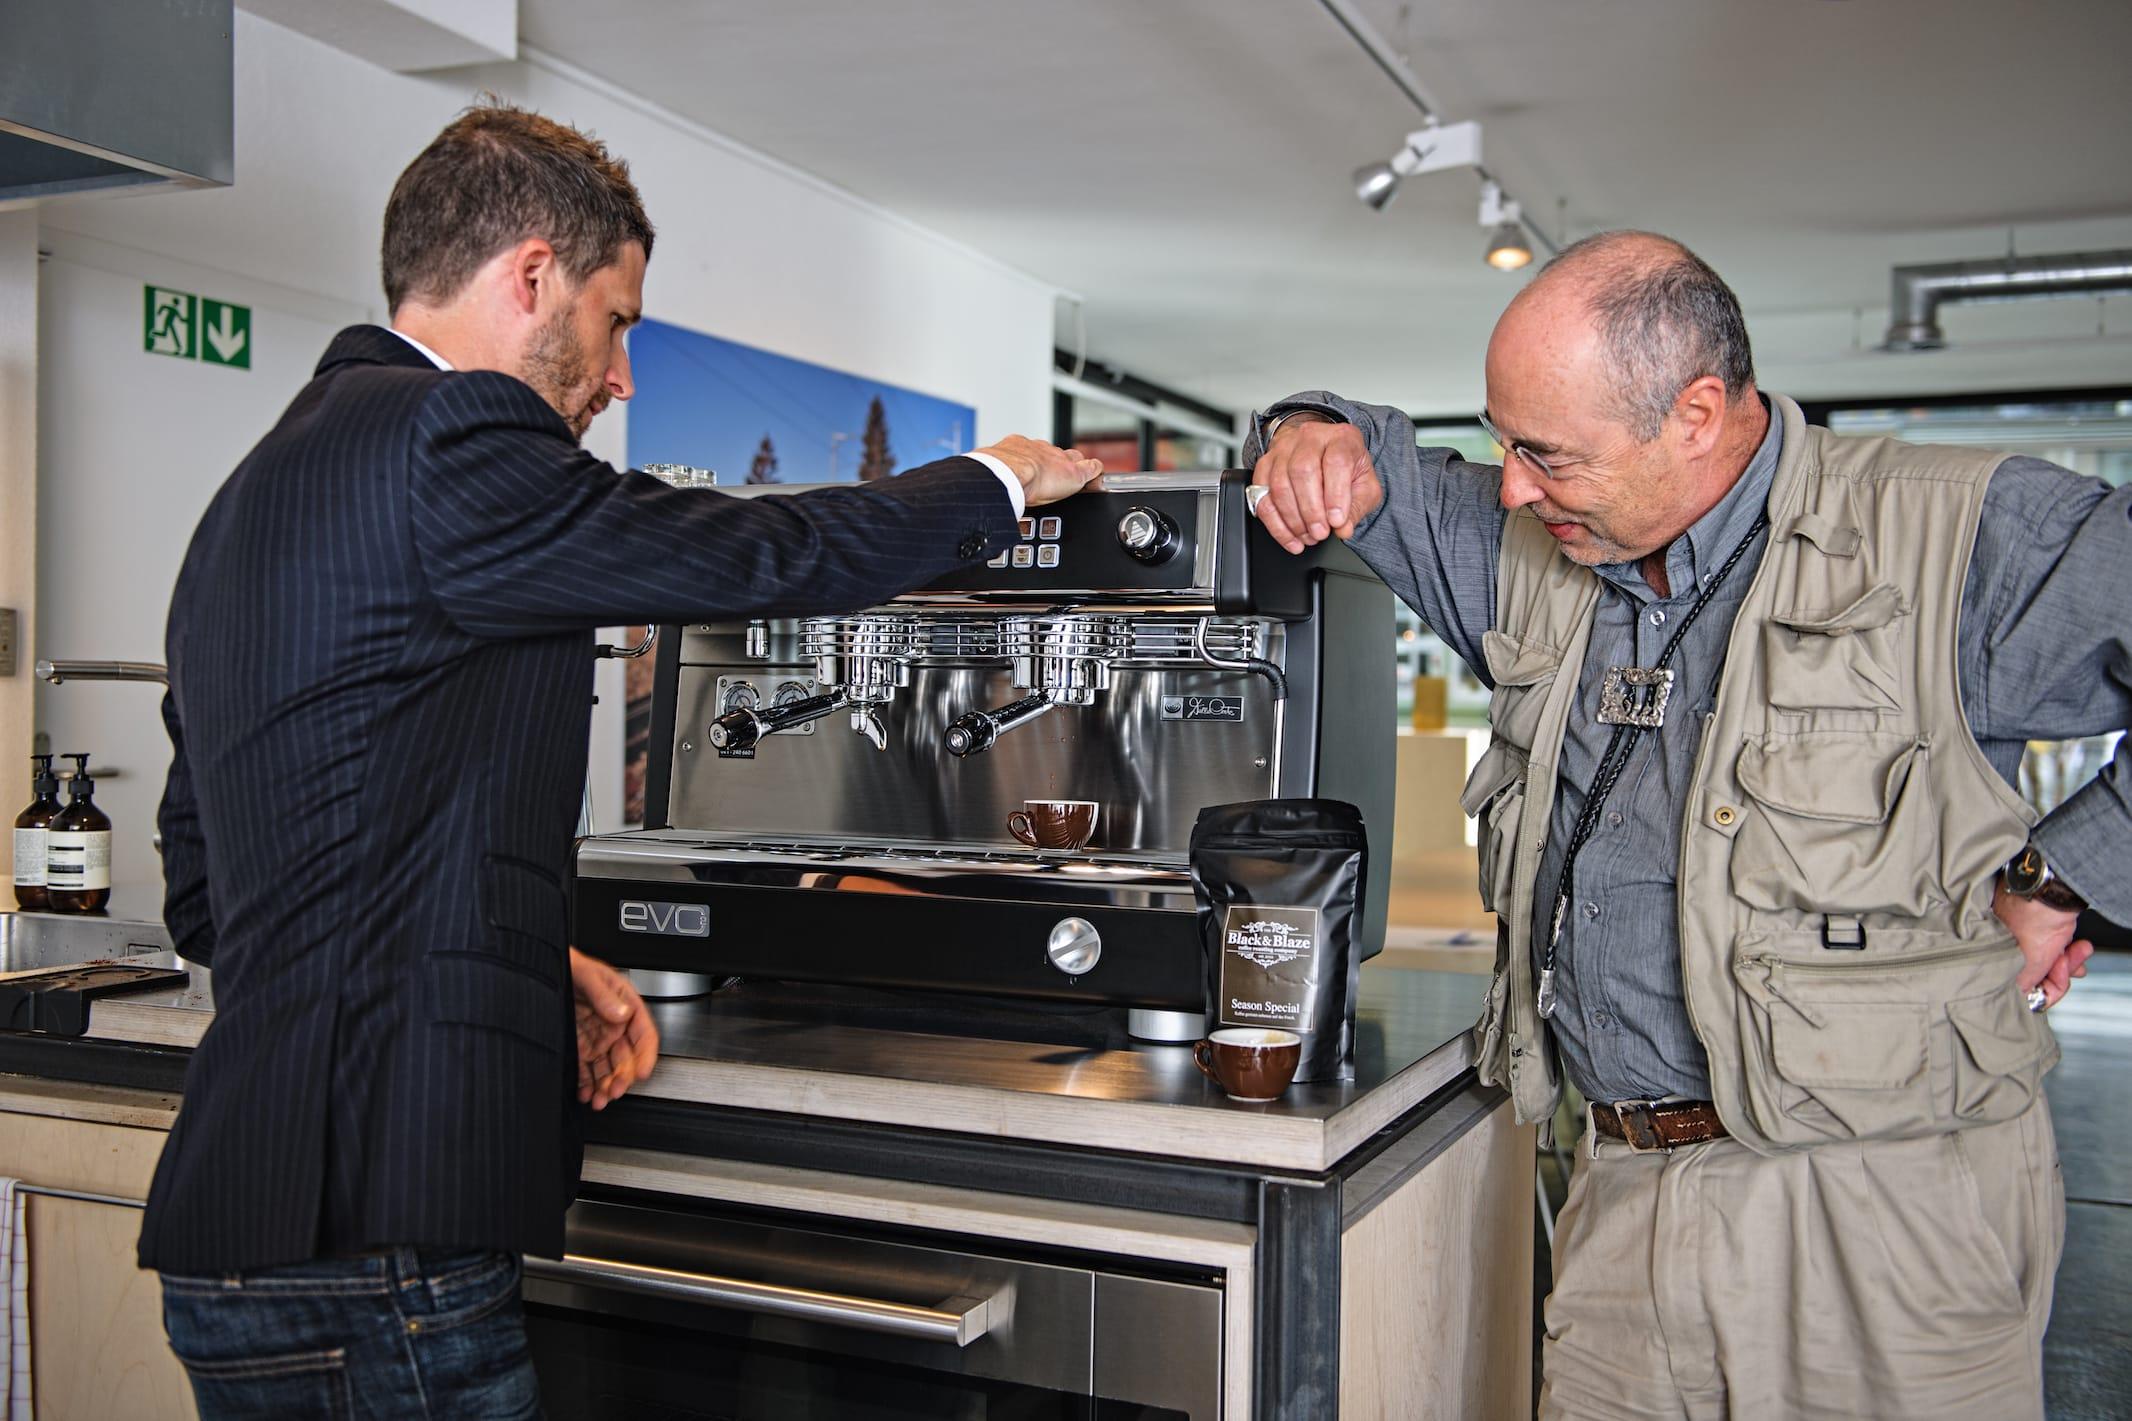 beat-weinmann-and-ludwig-oechslin-espresso-blogpost-oct-2014-vico20141015_0017_RGB-2132px